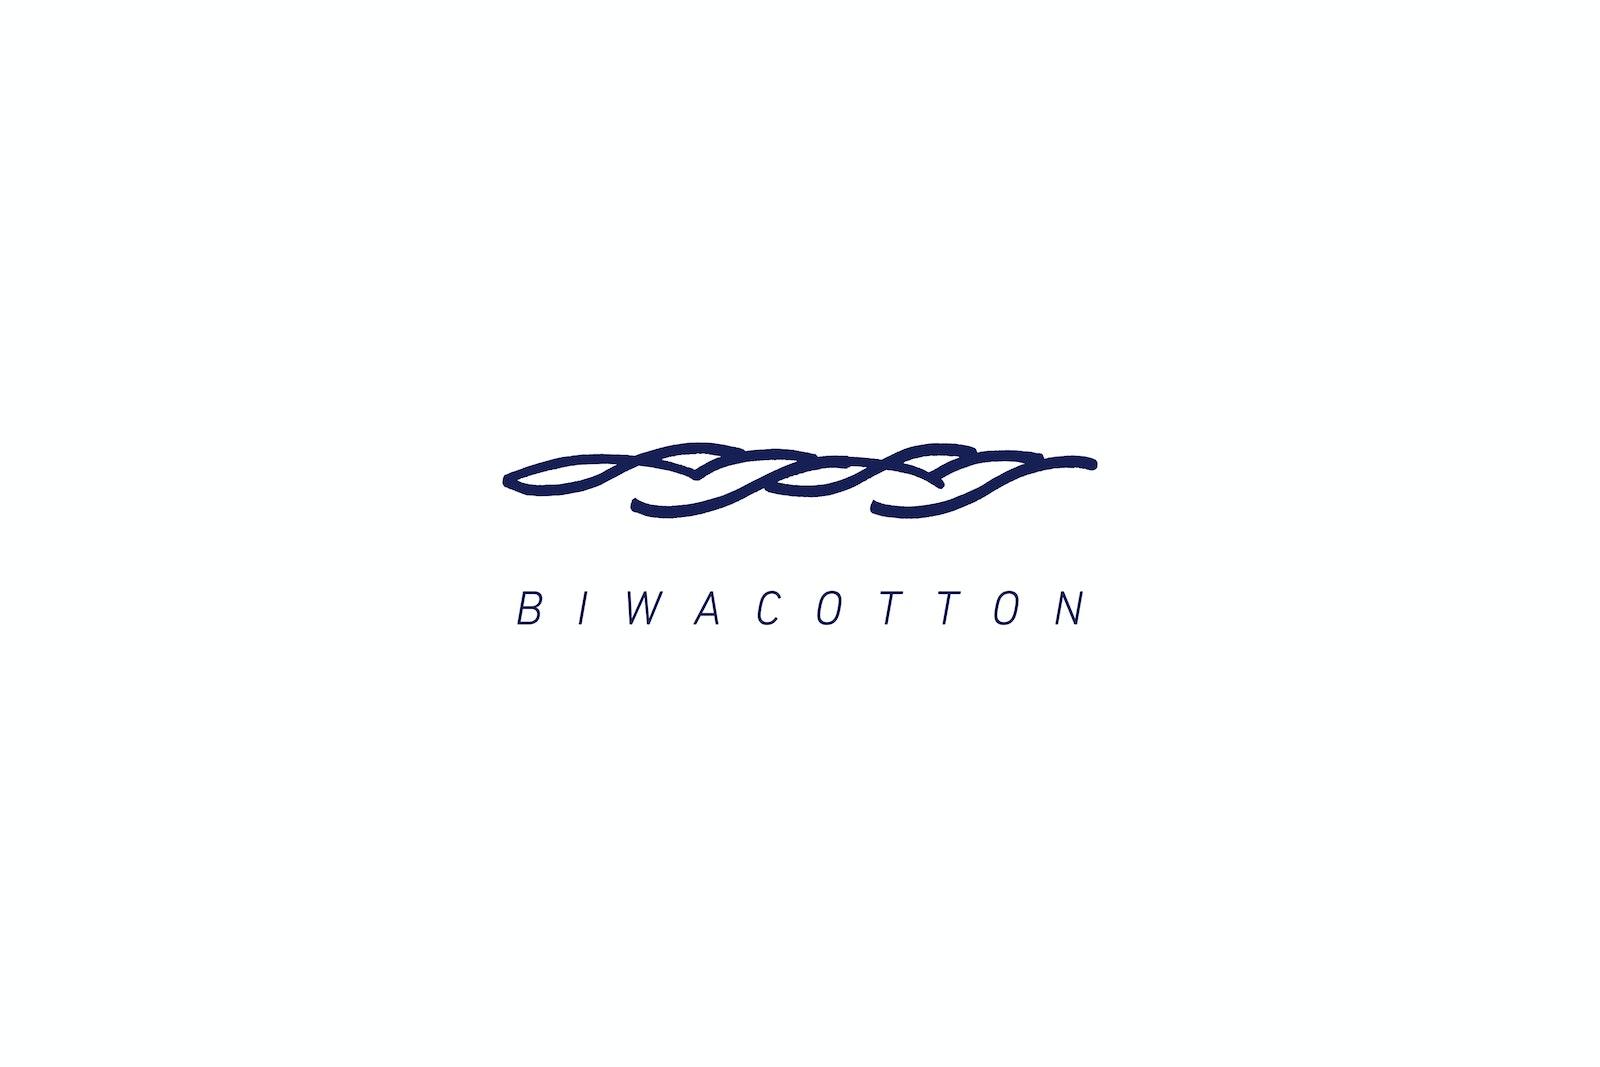 Biwacotton